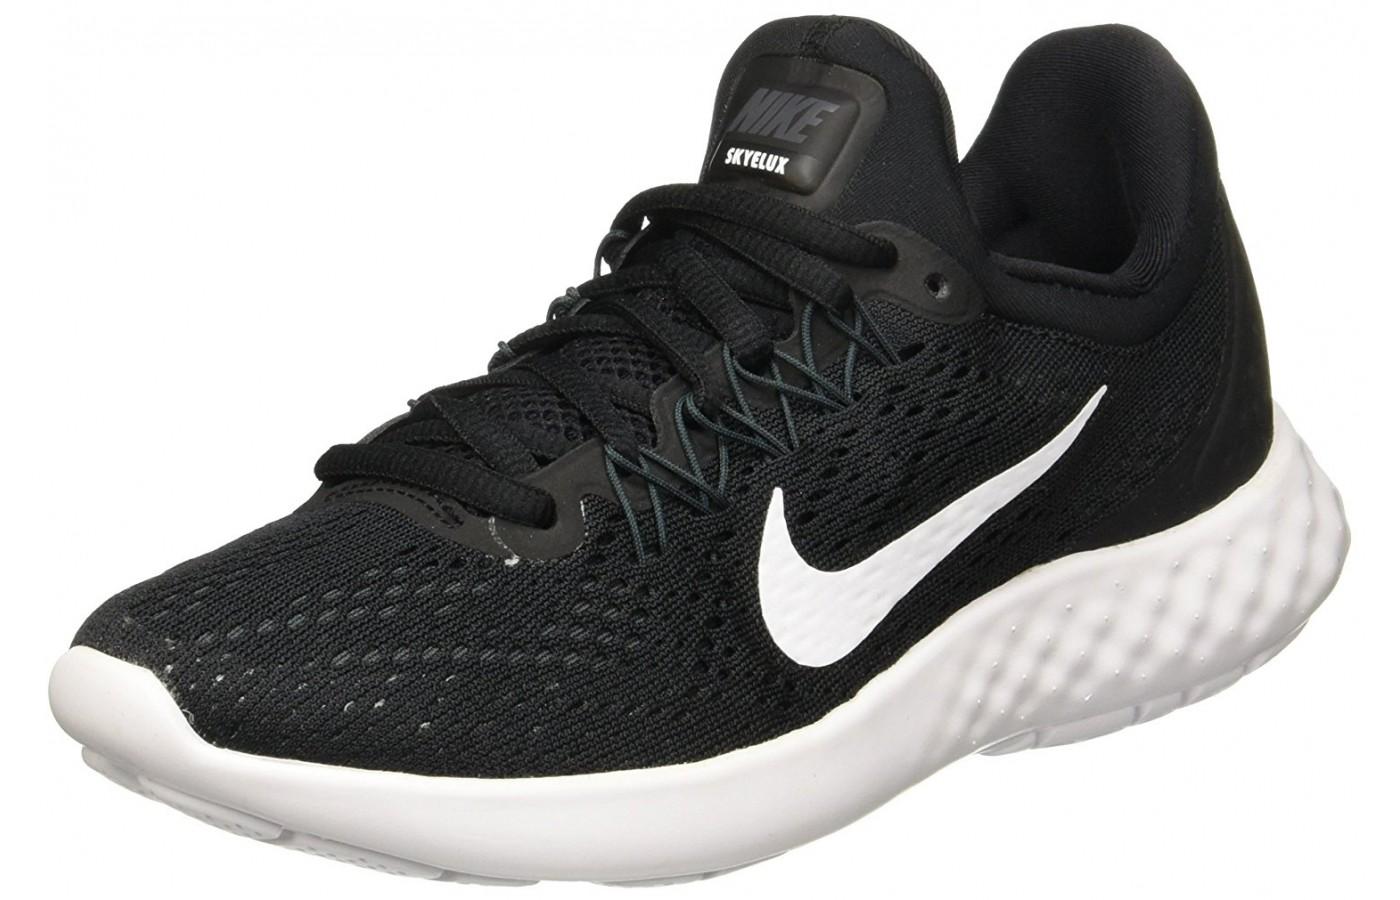 Nike Skylux angled